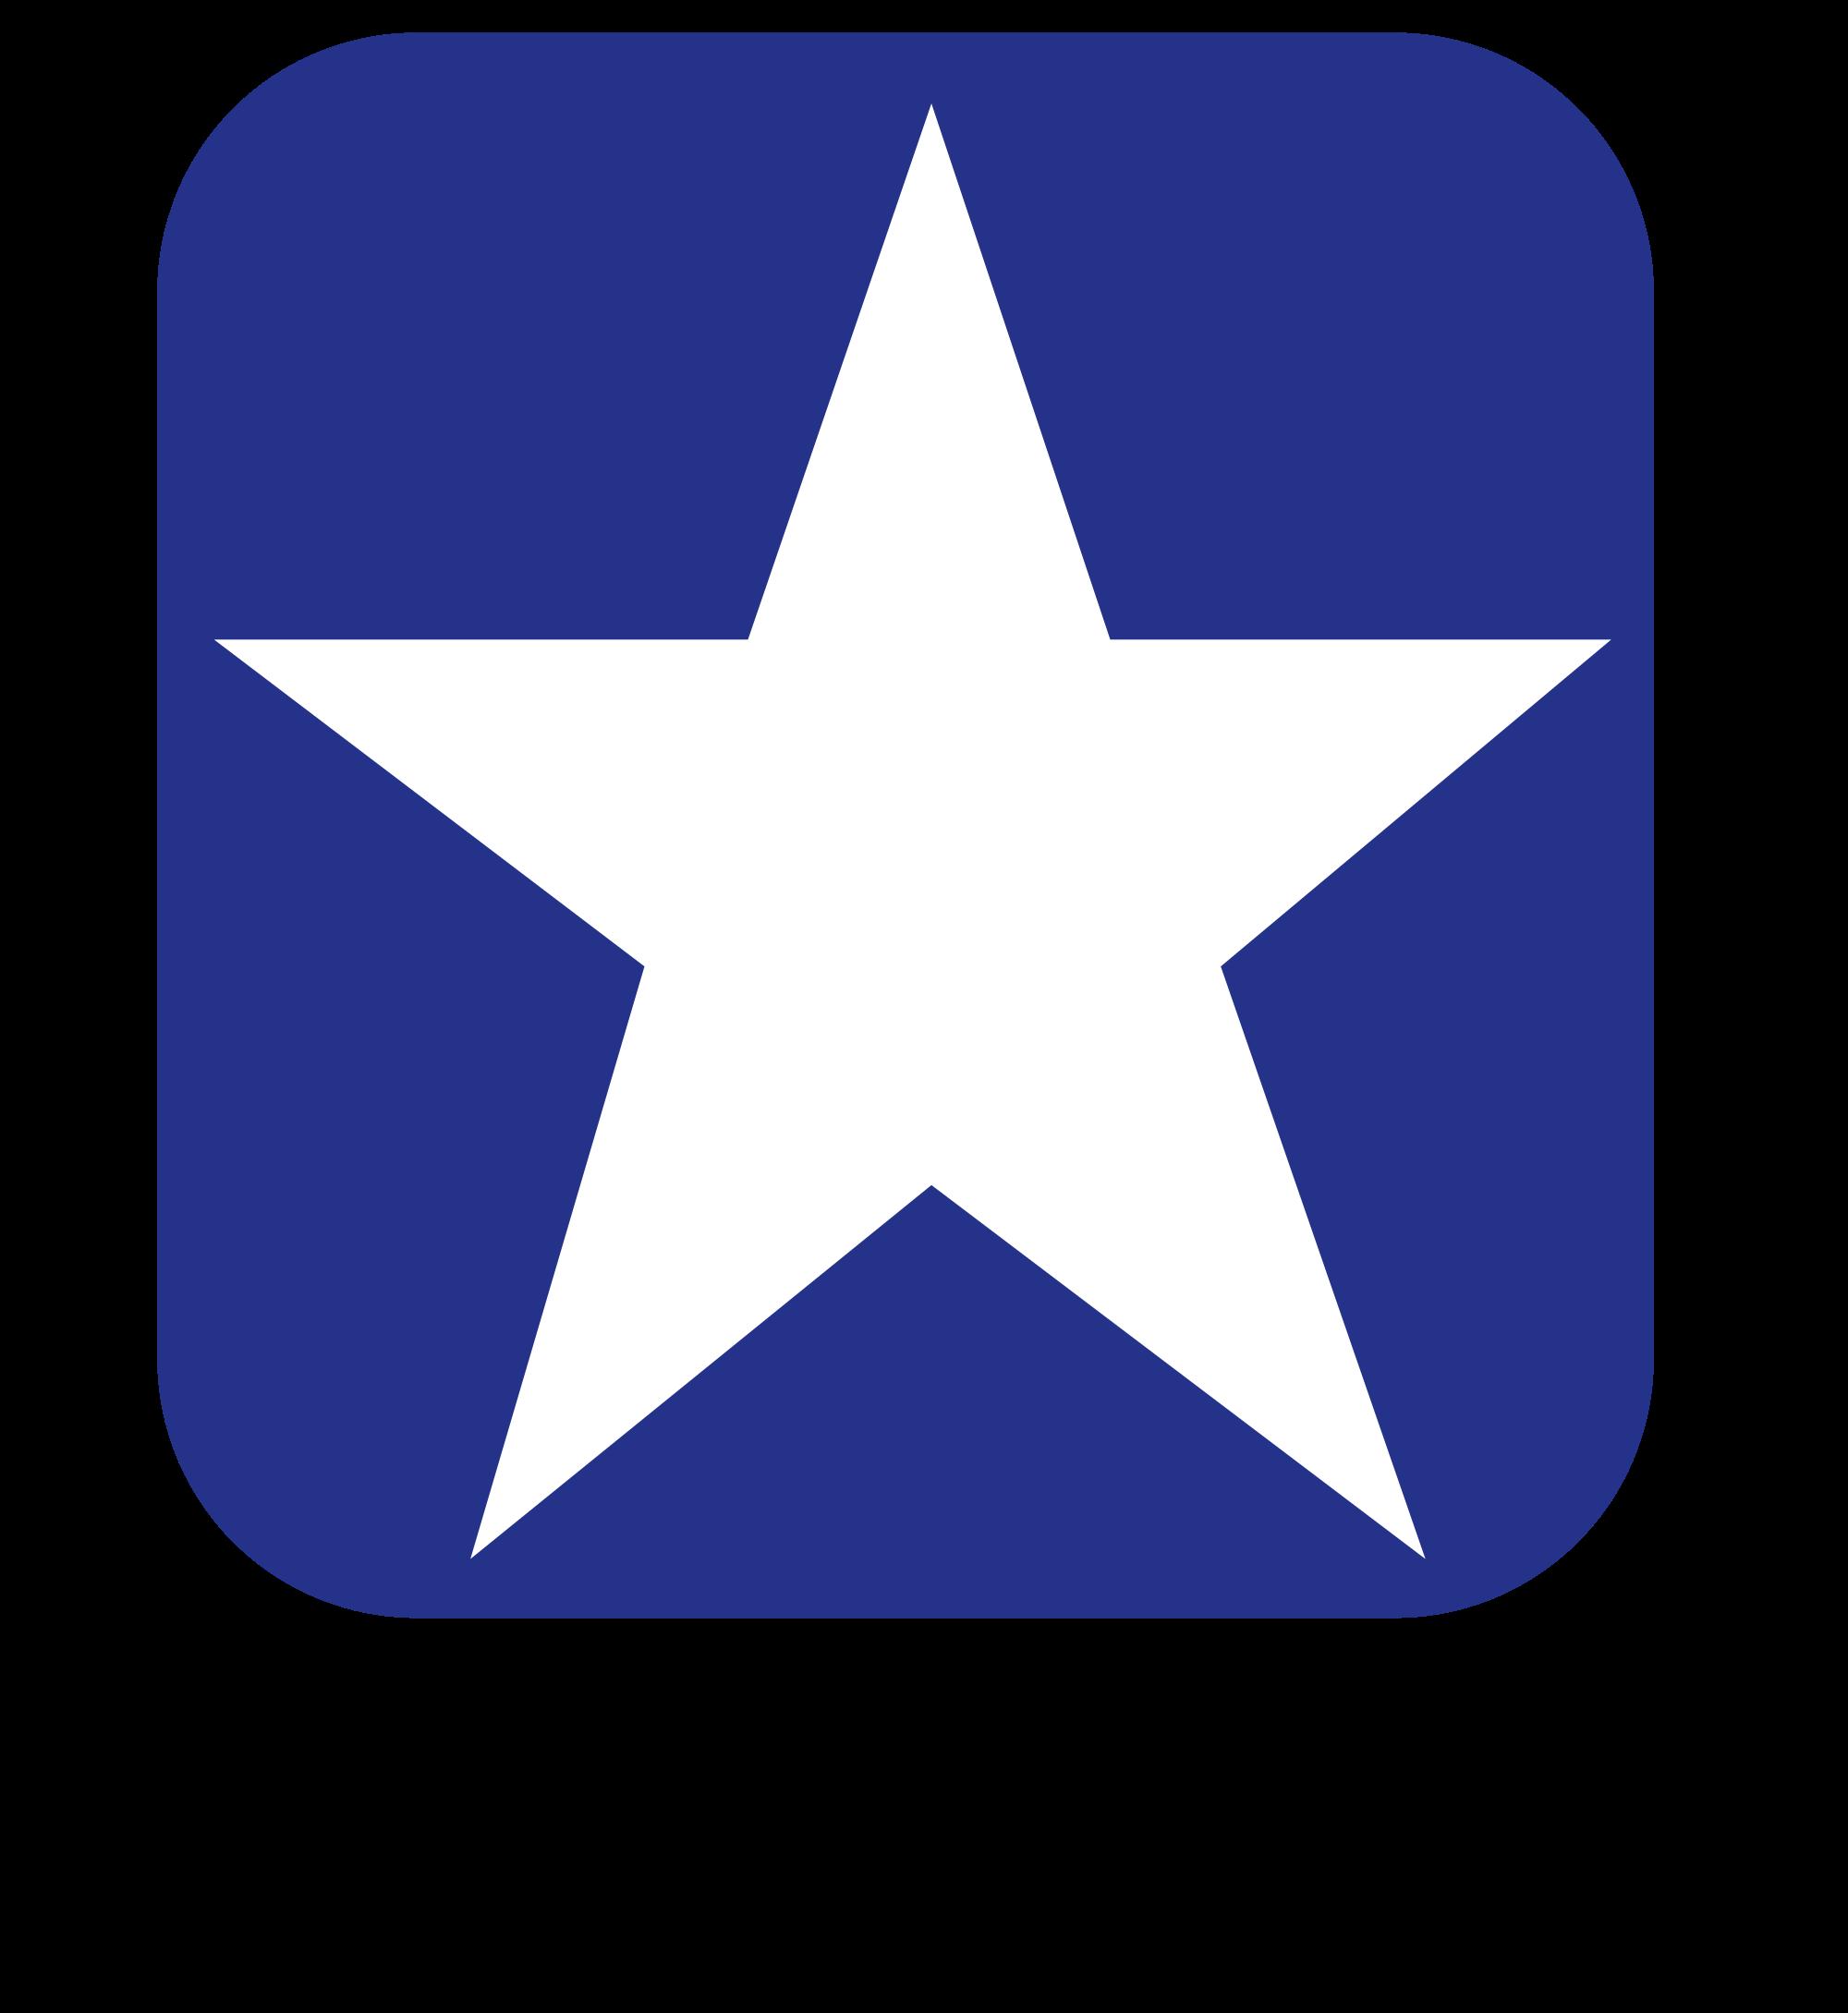 Logo Converse Png - Logo Converse Clipart (2000x2179), Png Download